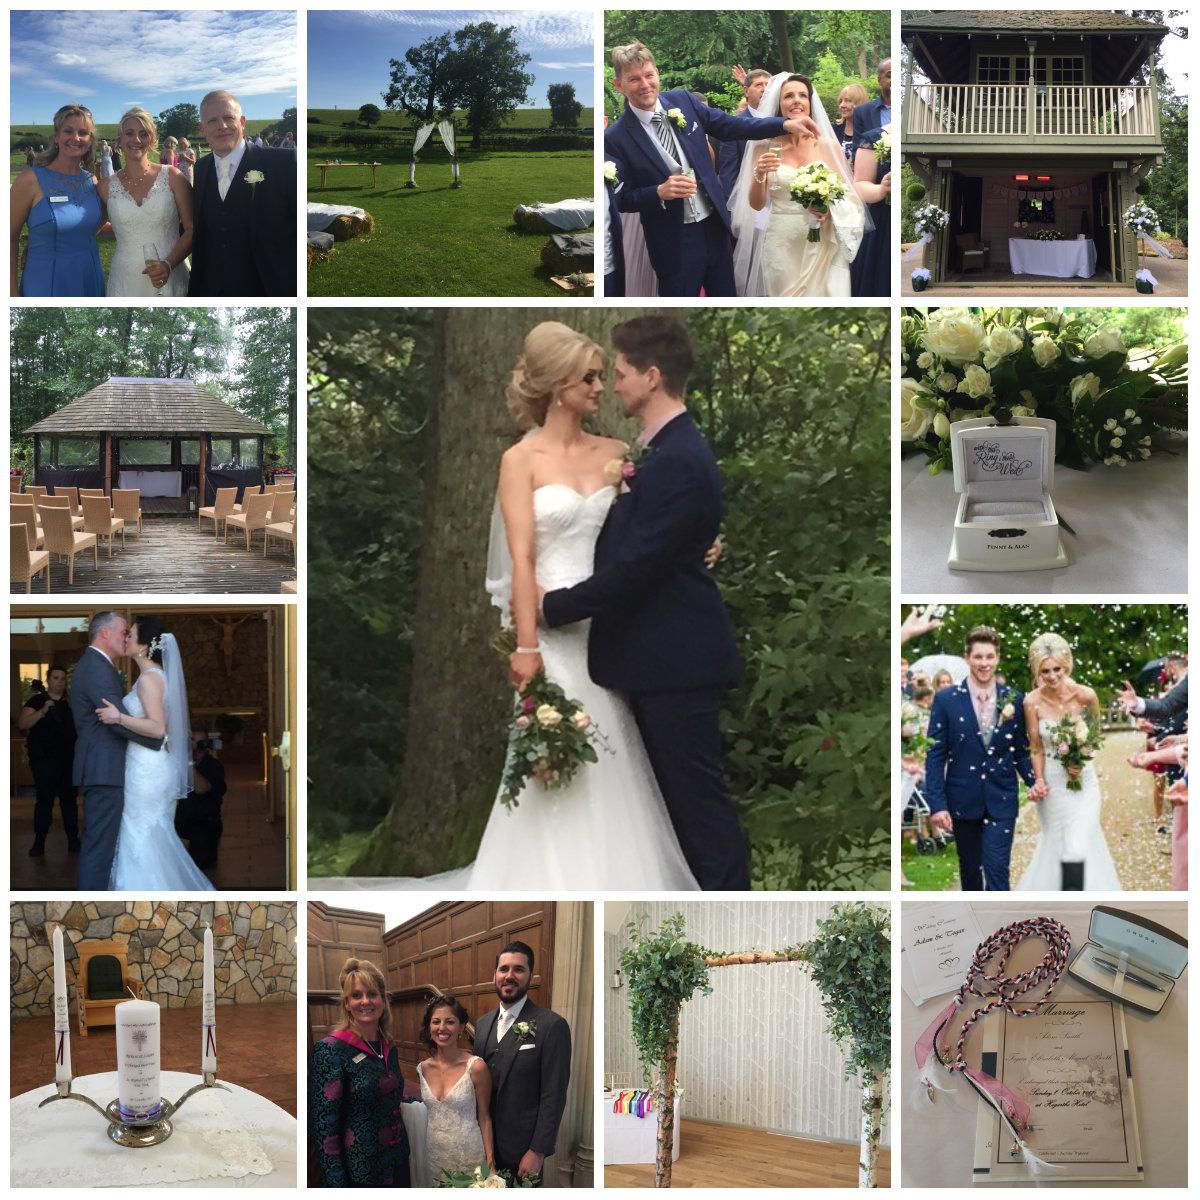 2017 weddings Just Celebrations Celebrant